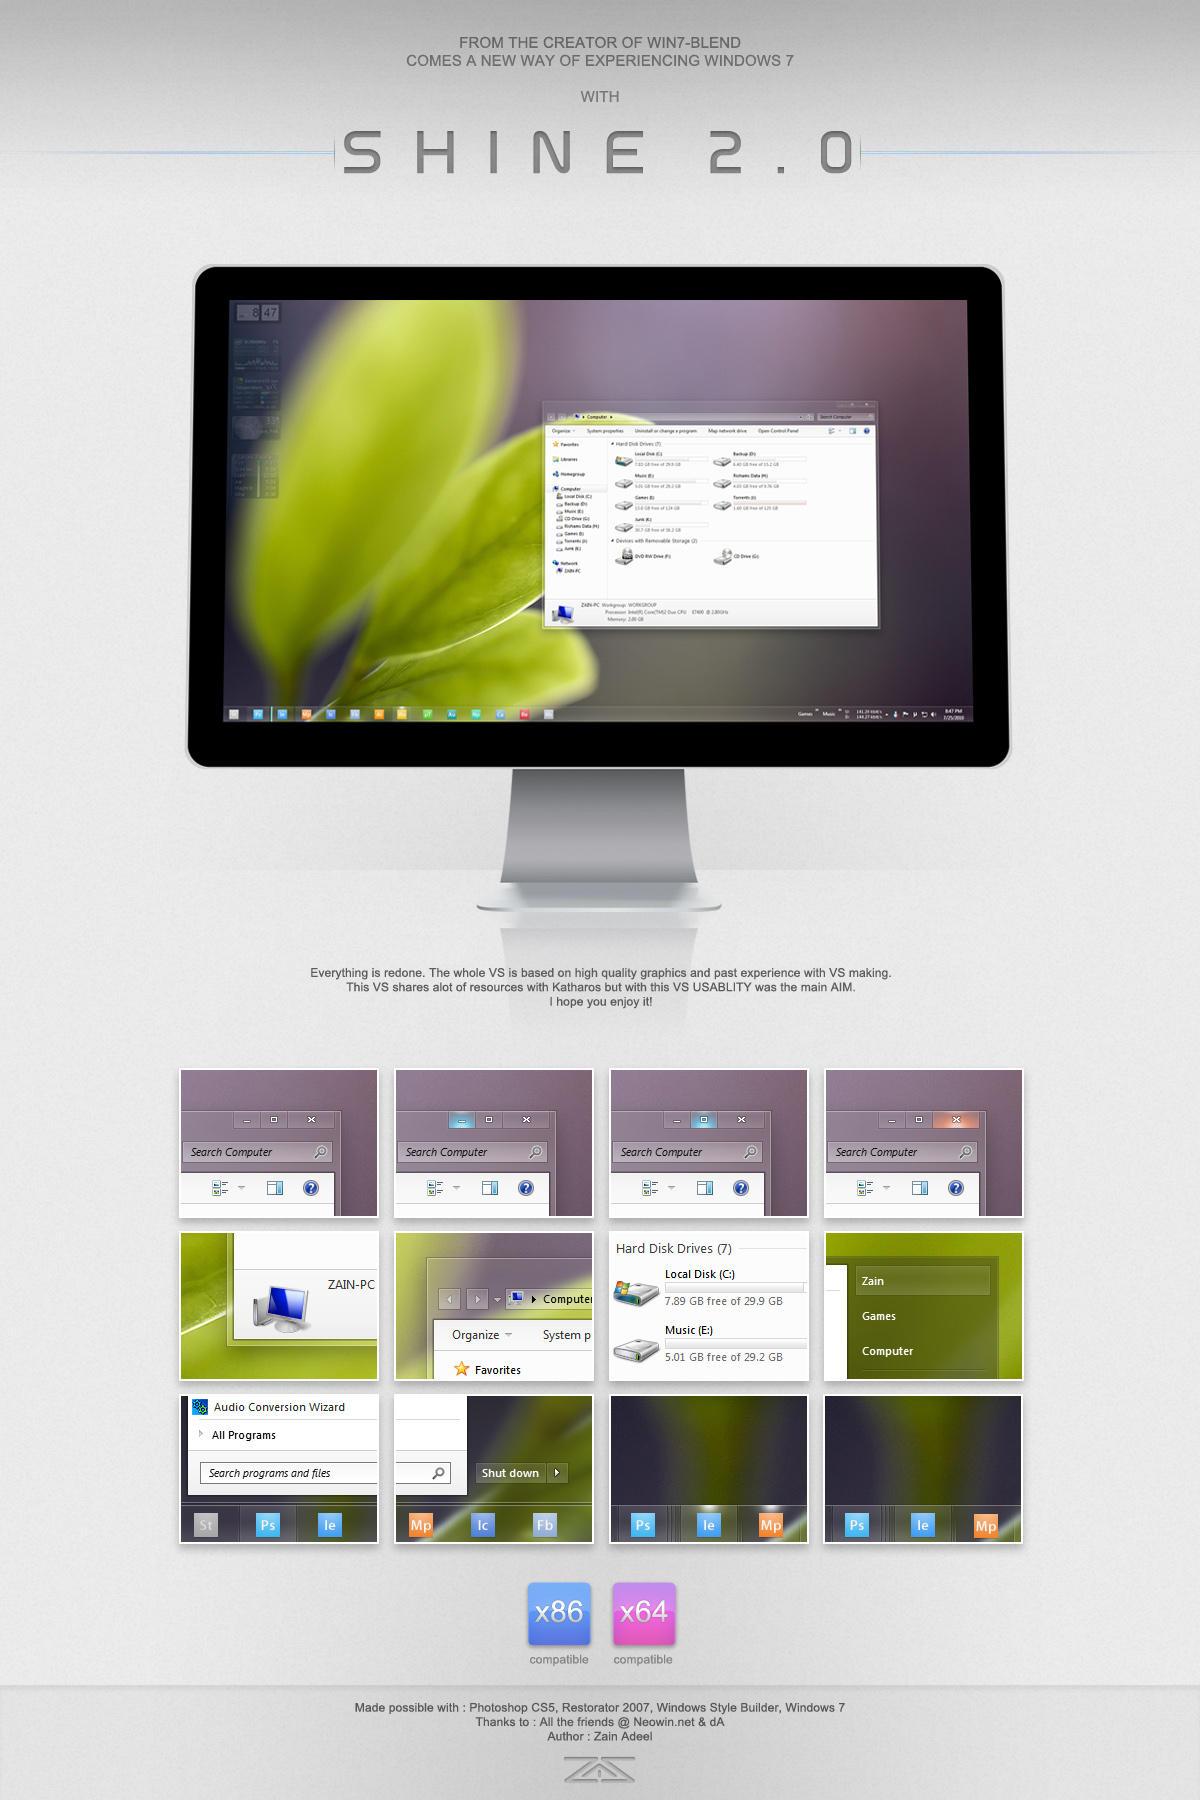 Shine 2.0 for Windows 7 by zainadeel